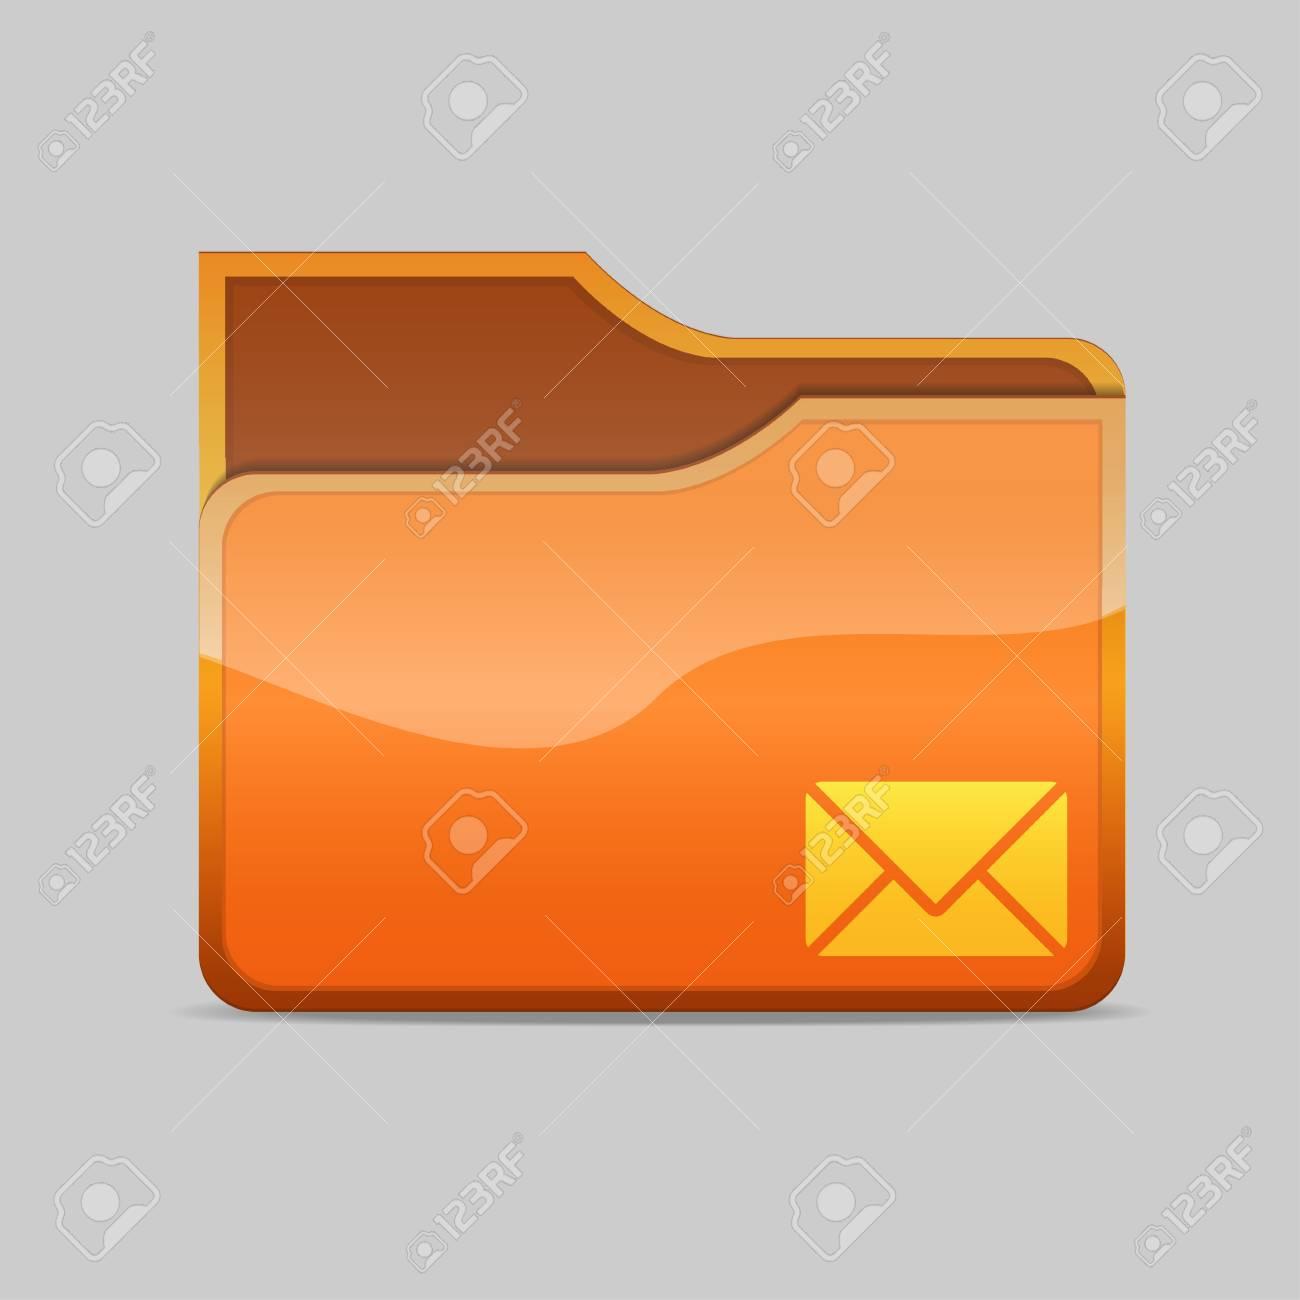 a mail folder icon Stock Photo - 16484501